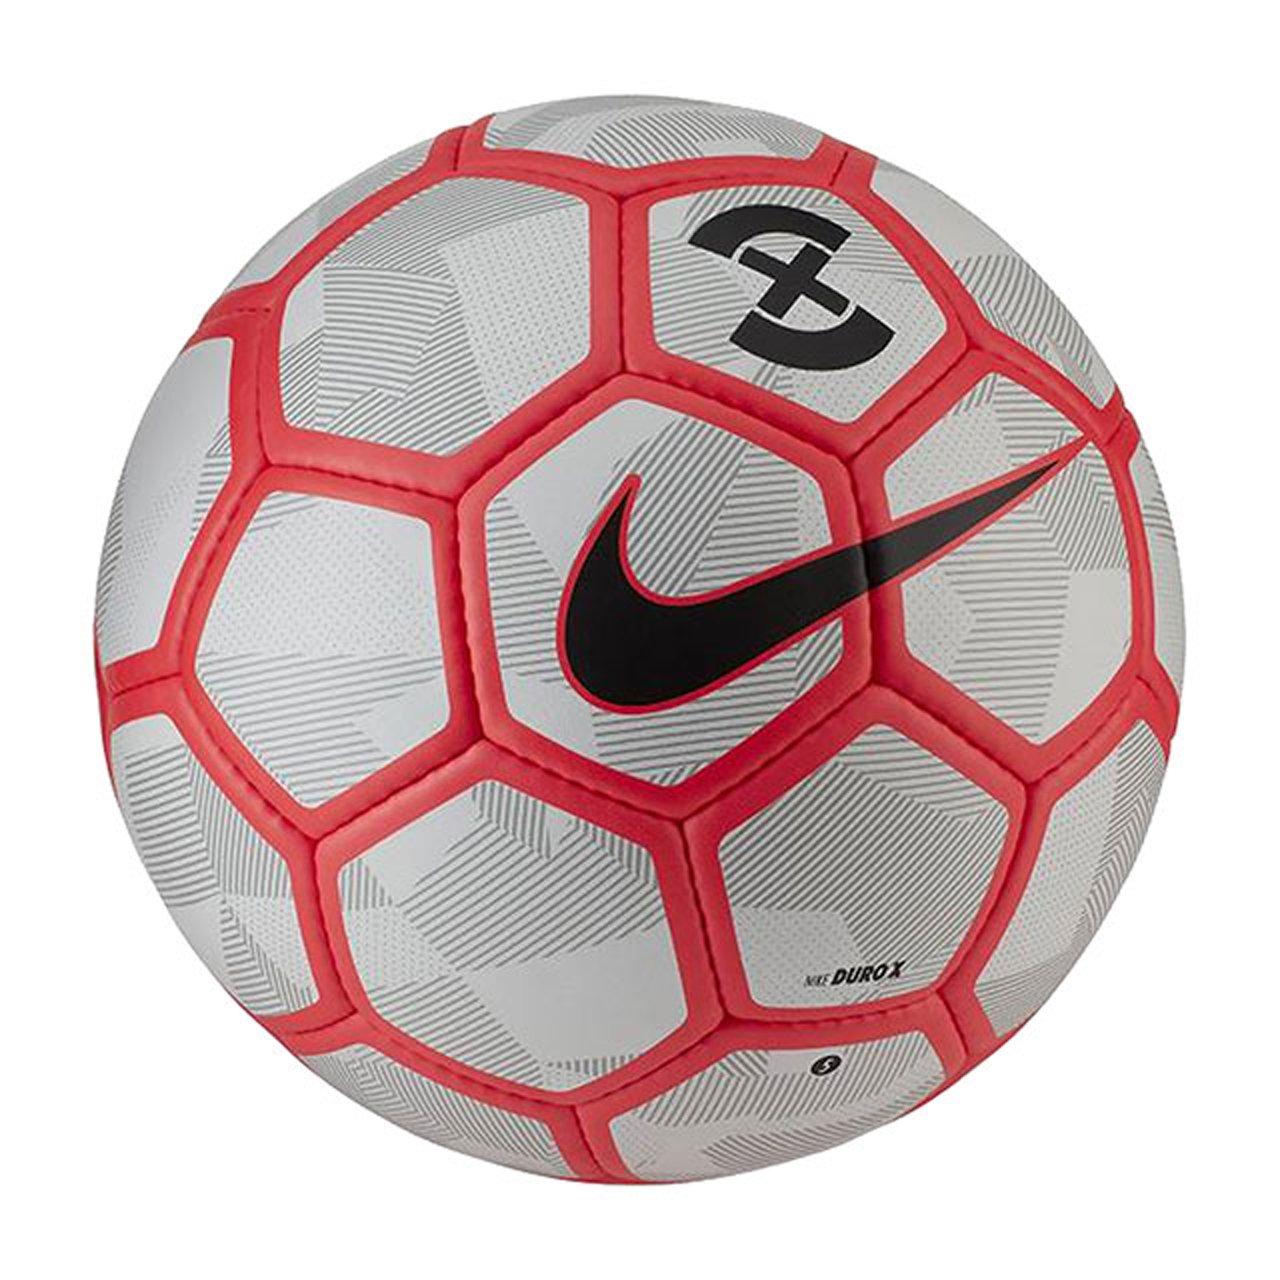 Nike Duro X balón de fútbol, Pure Platinum/Bright Crimson: Amazon ...